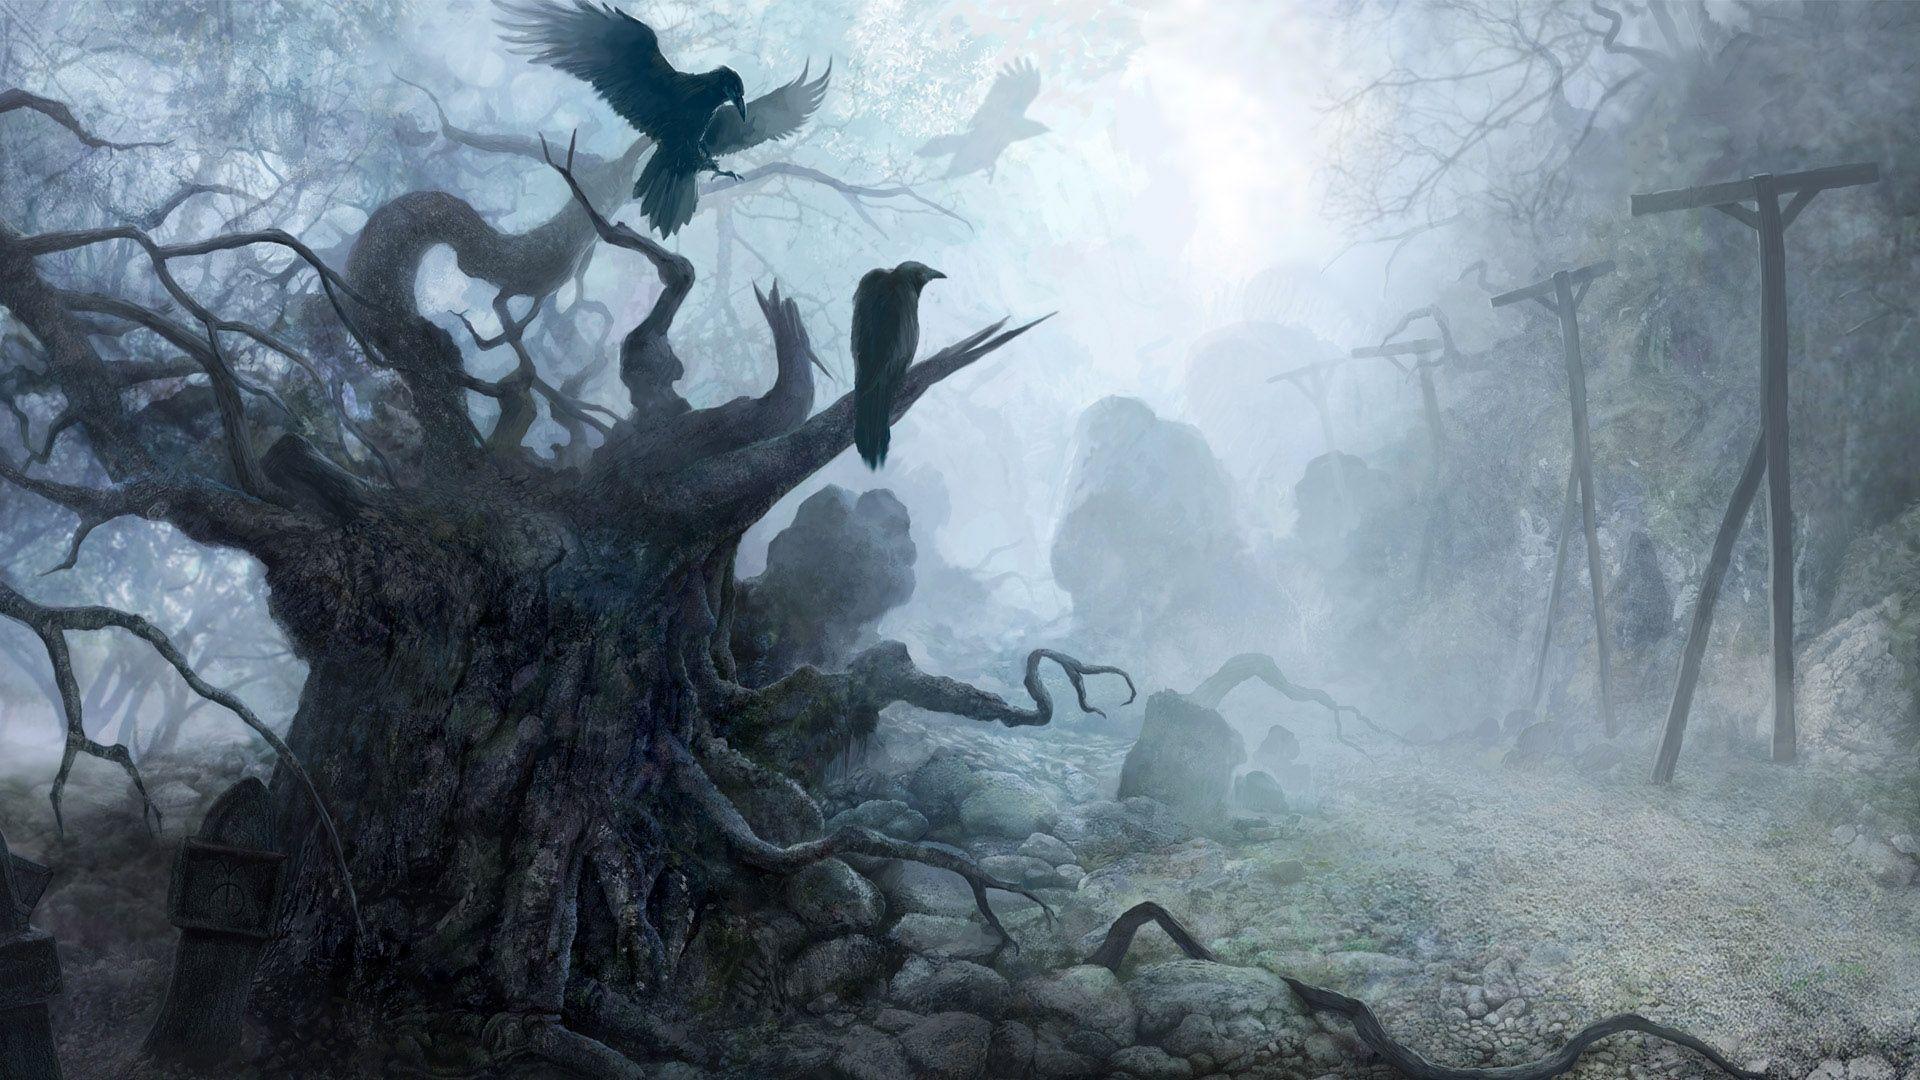 2930 gothic dark art 3d fantasy places hd picture nr 47798